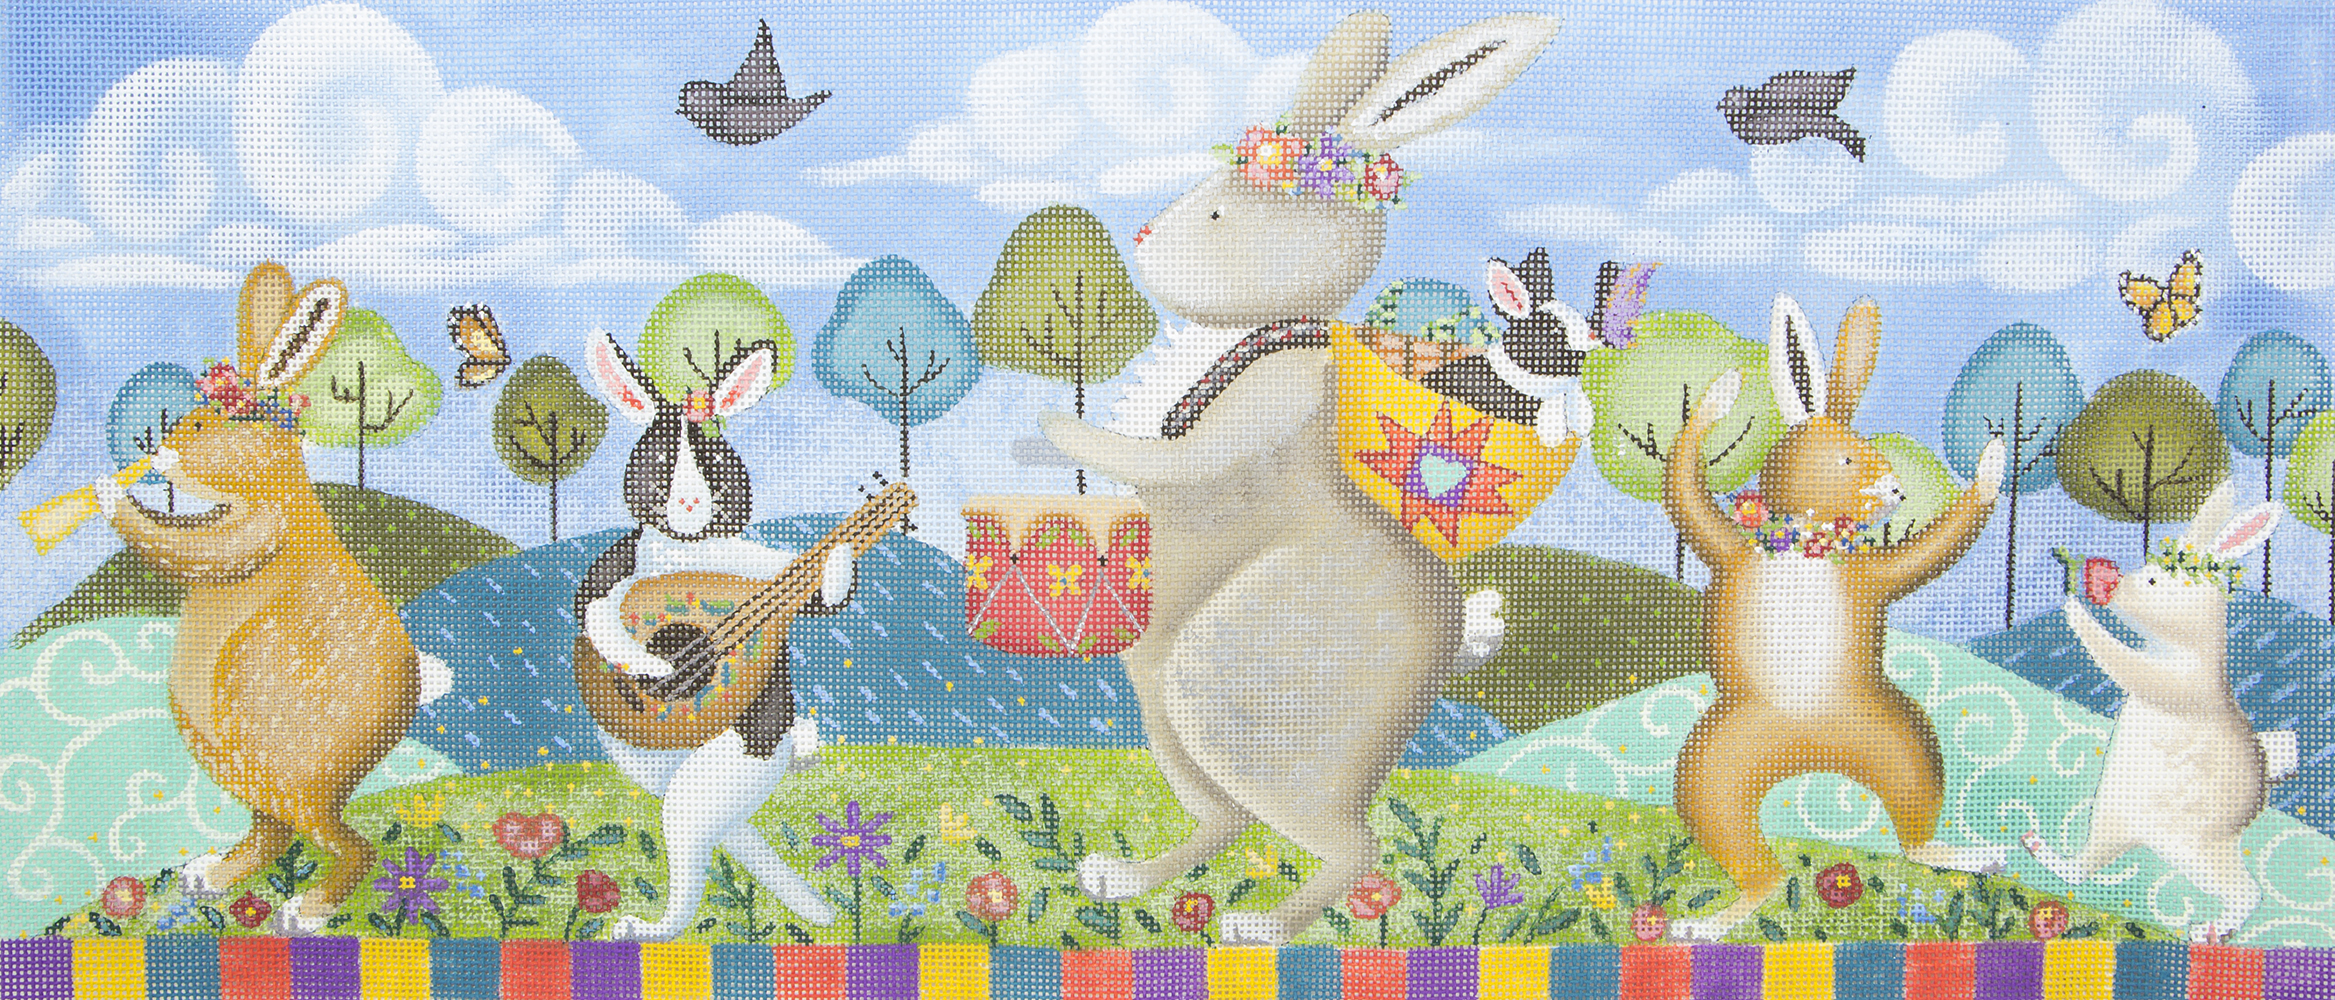 SRADP216 Rabbit Band Parade Susan Roberts